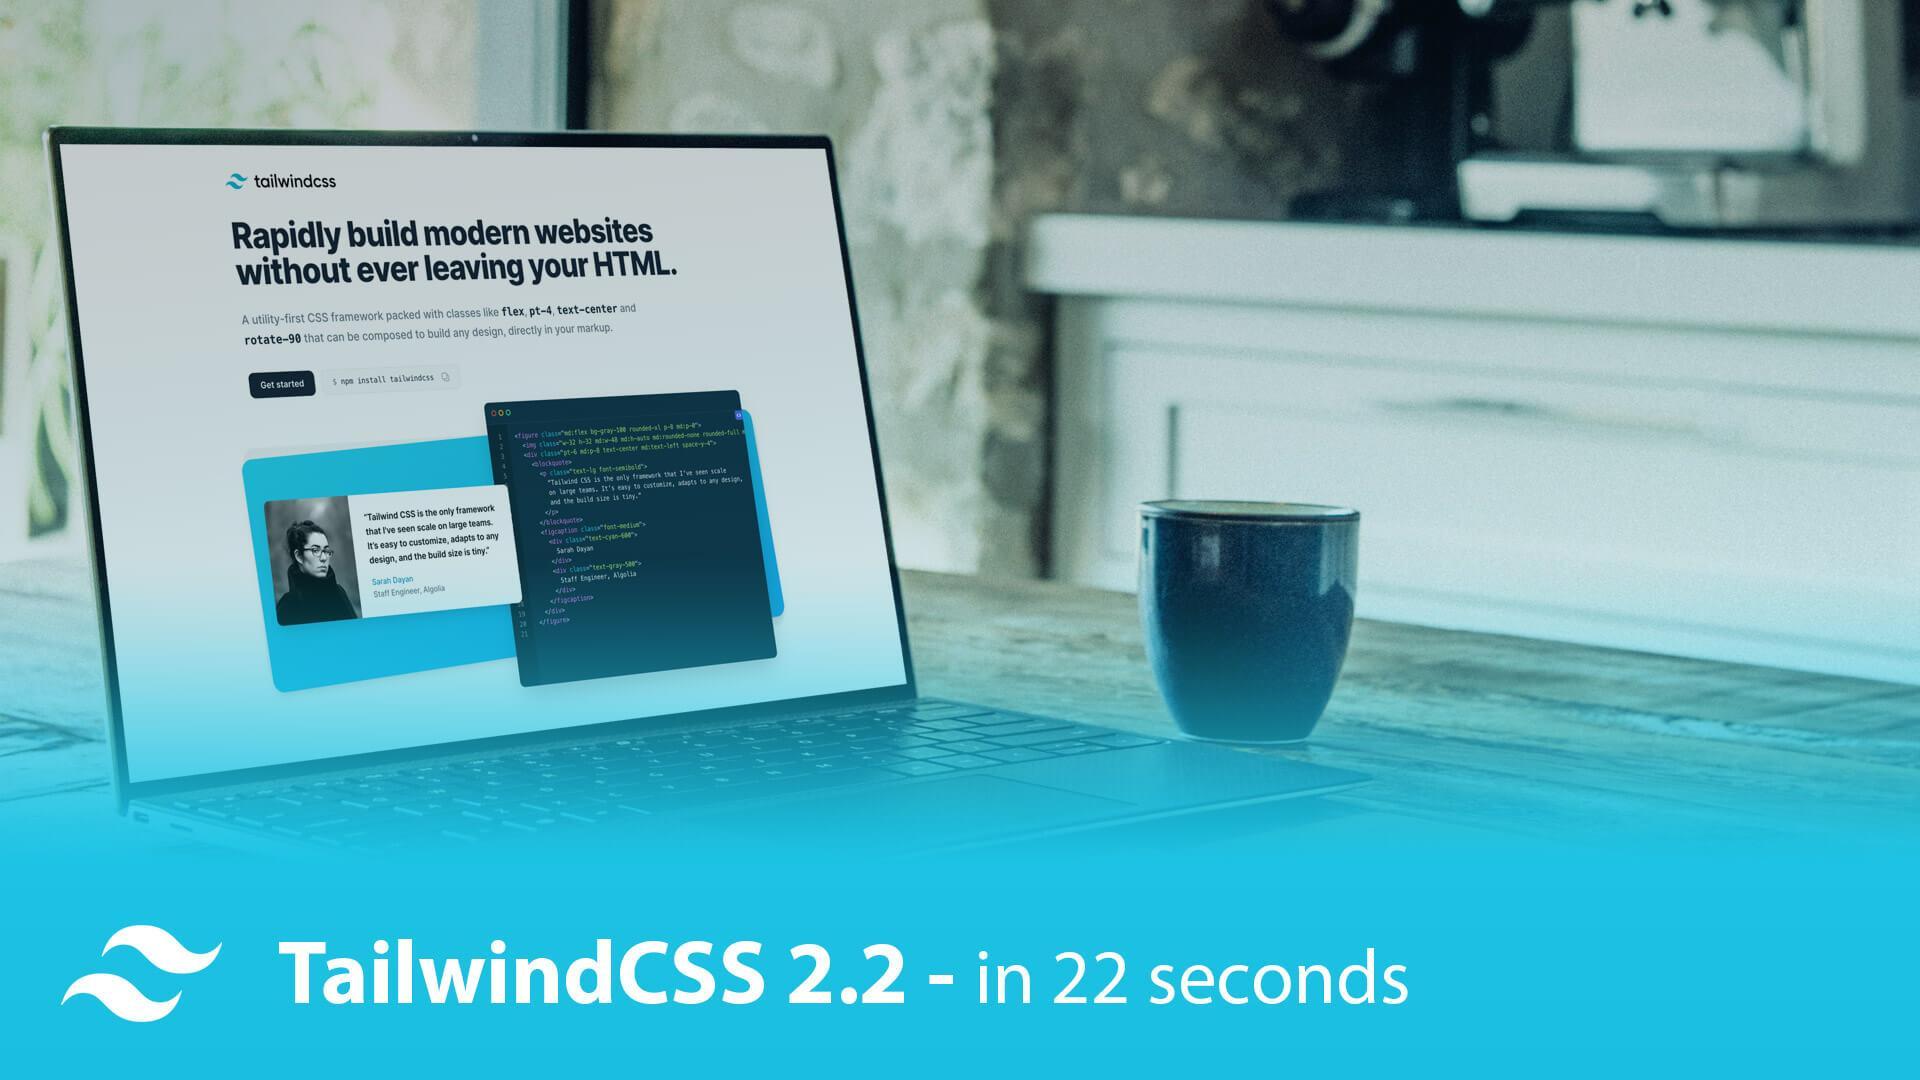 TailwindCSS 2.2 in 22 seconds